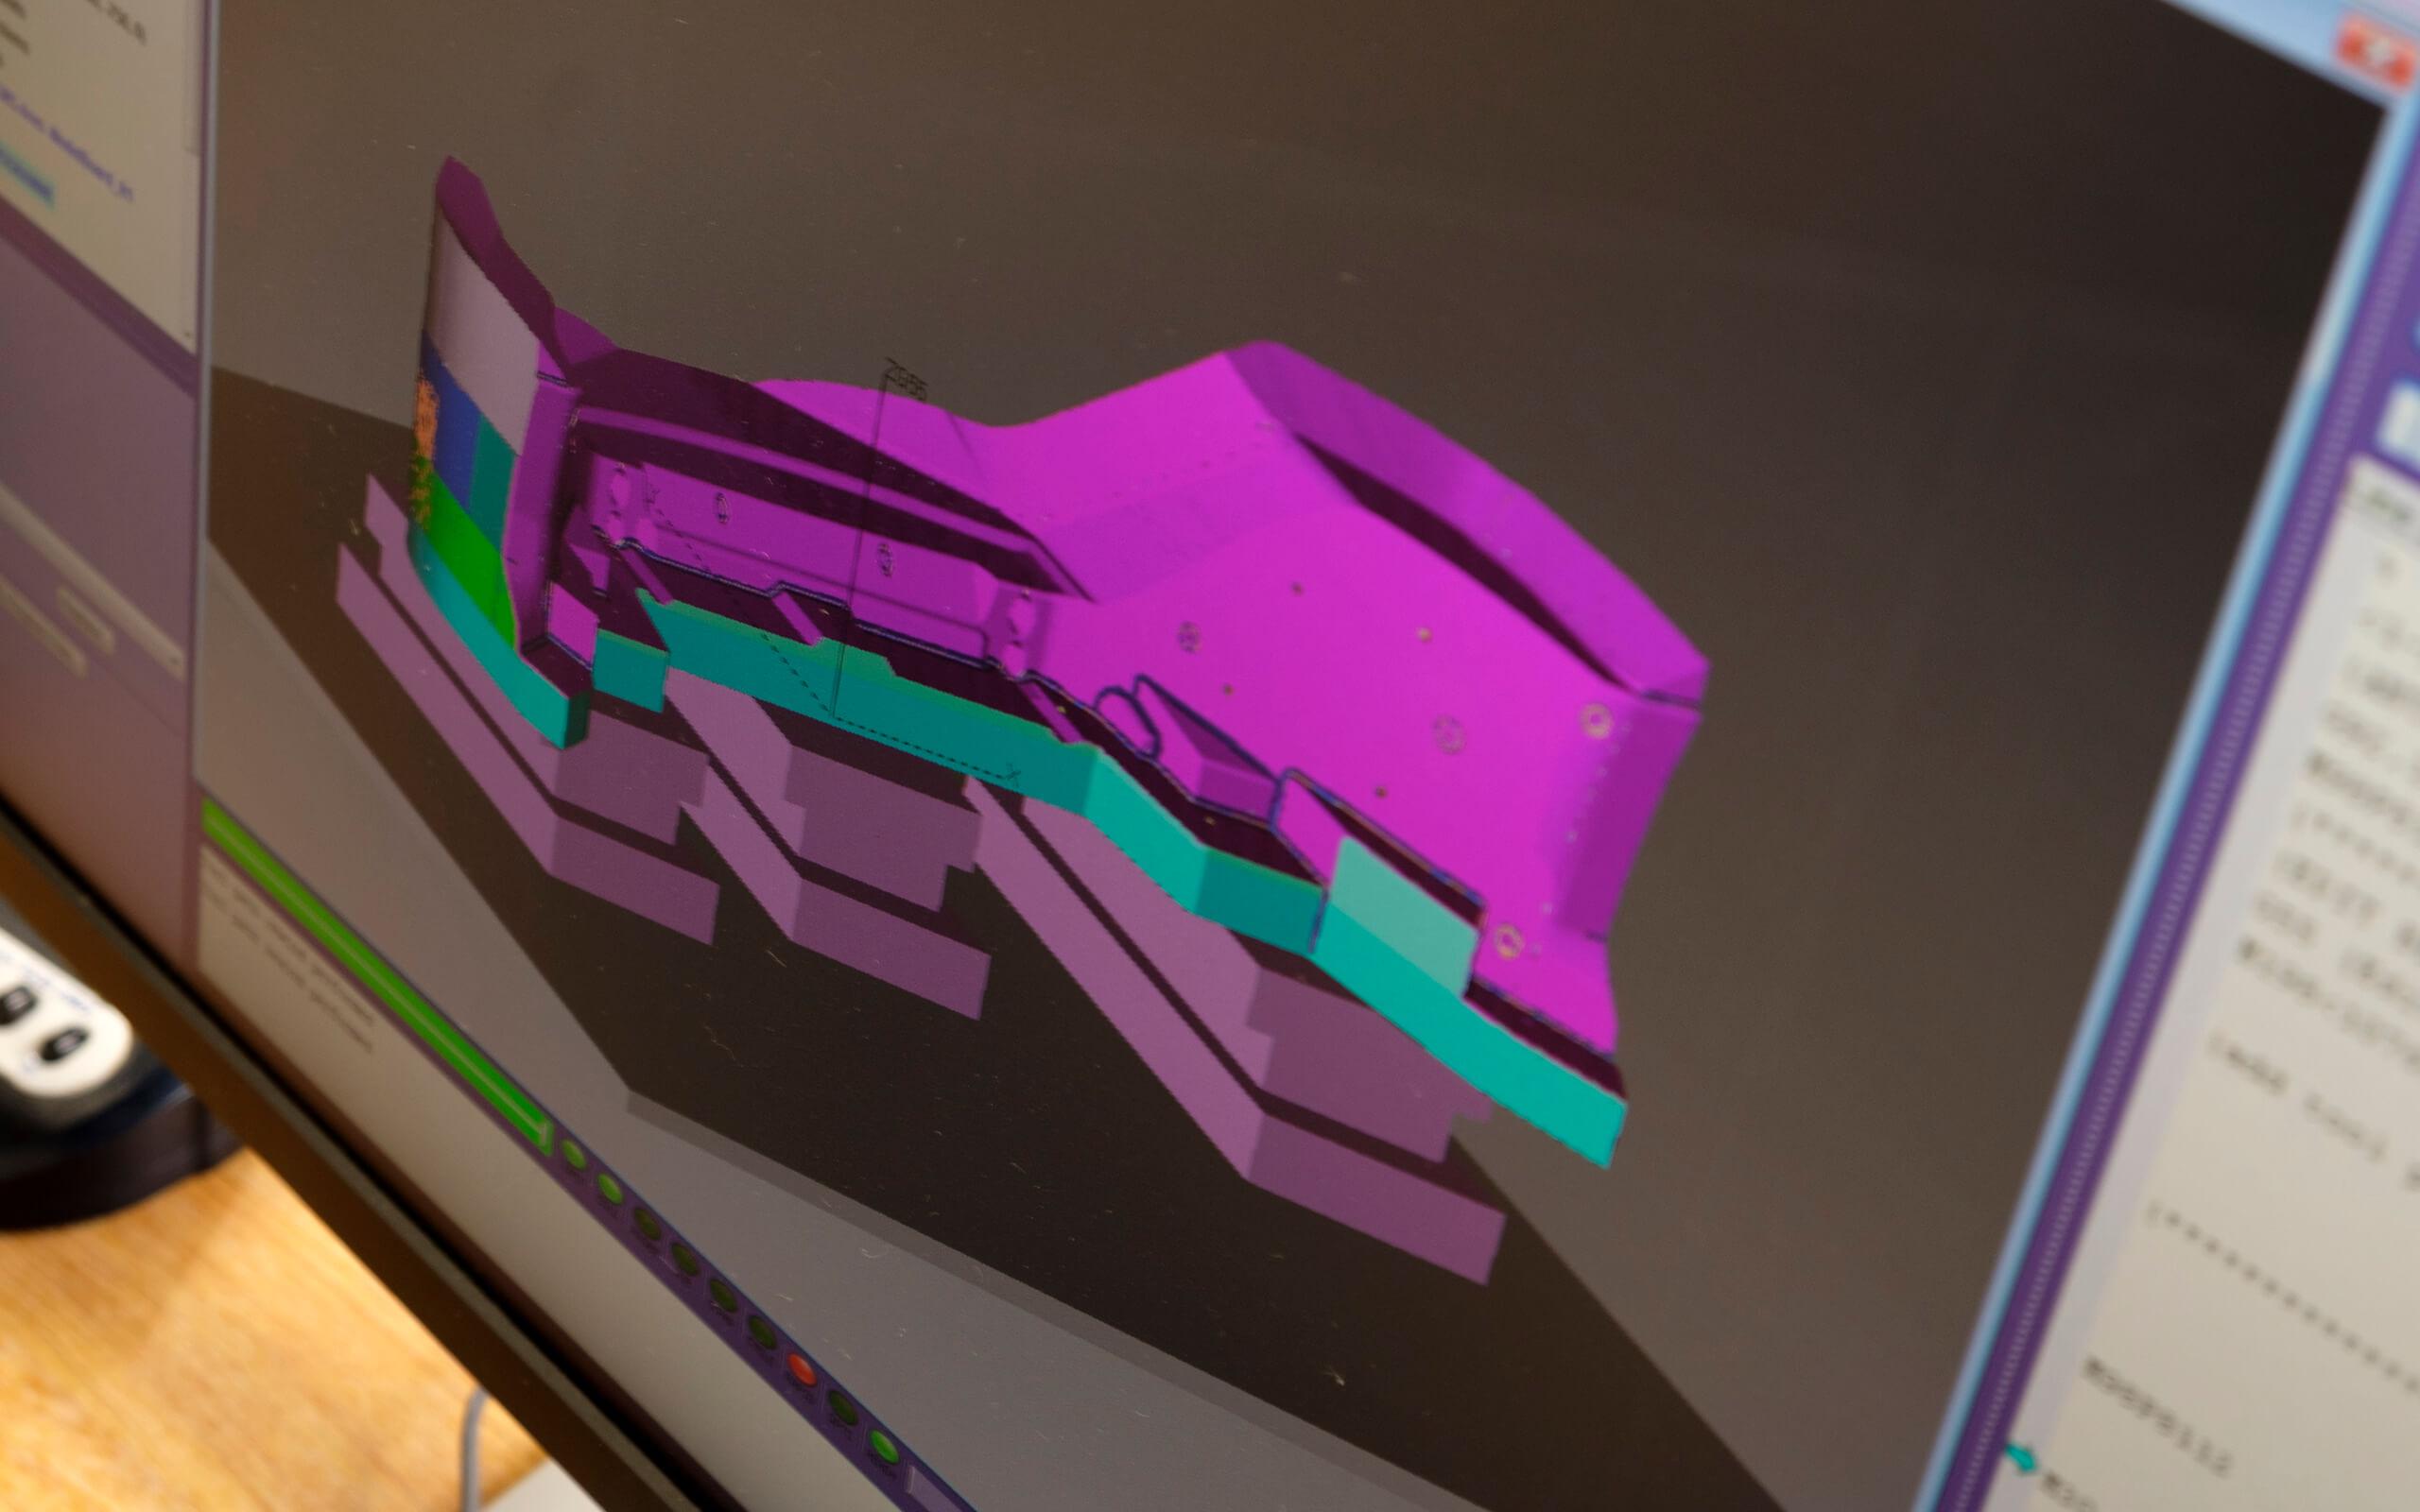 Digital 3D model design on a computer screen